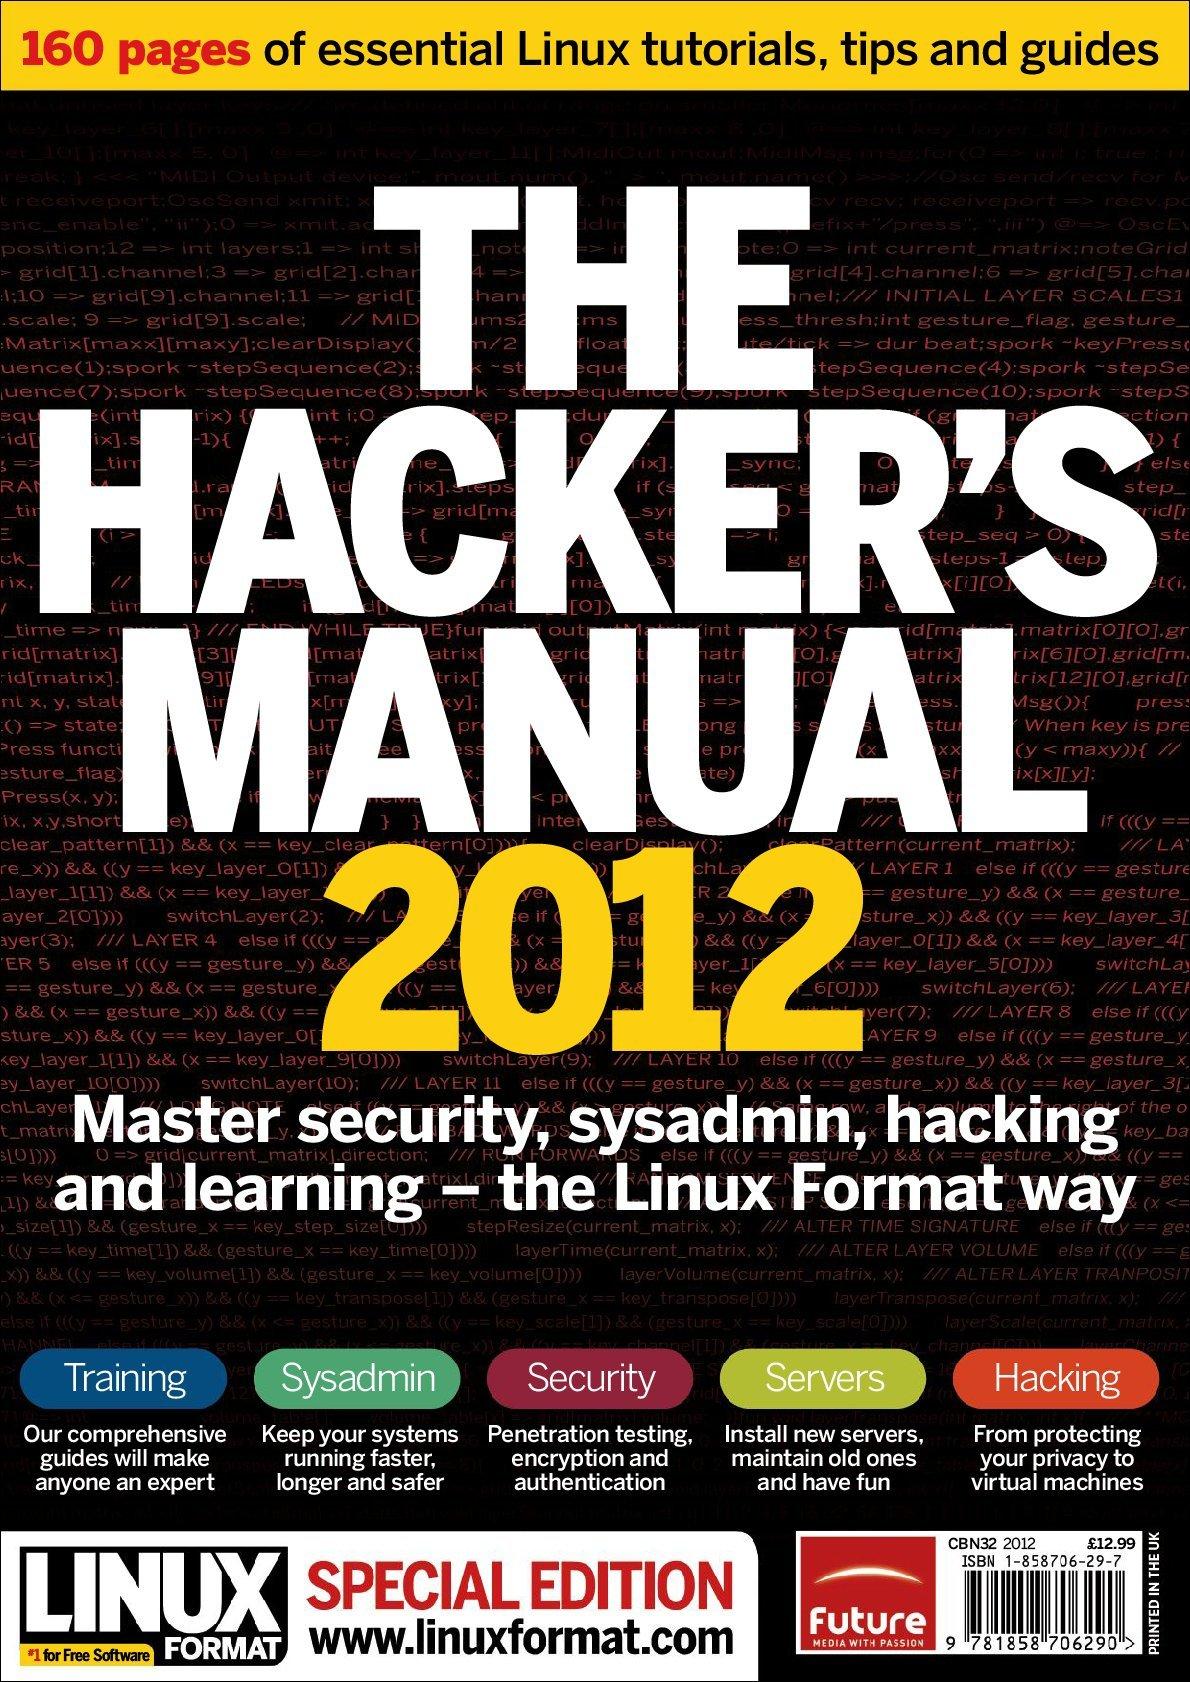 The Hackers Manual Digital